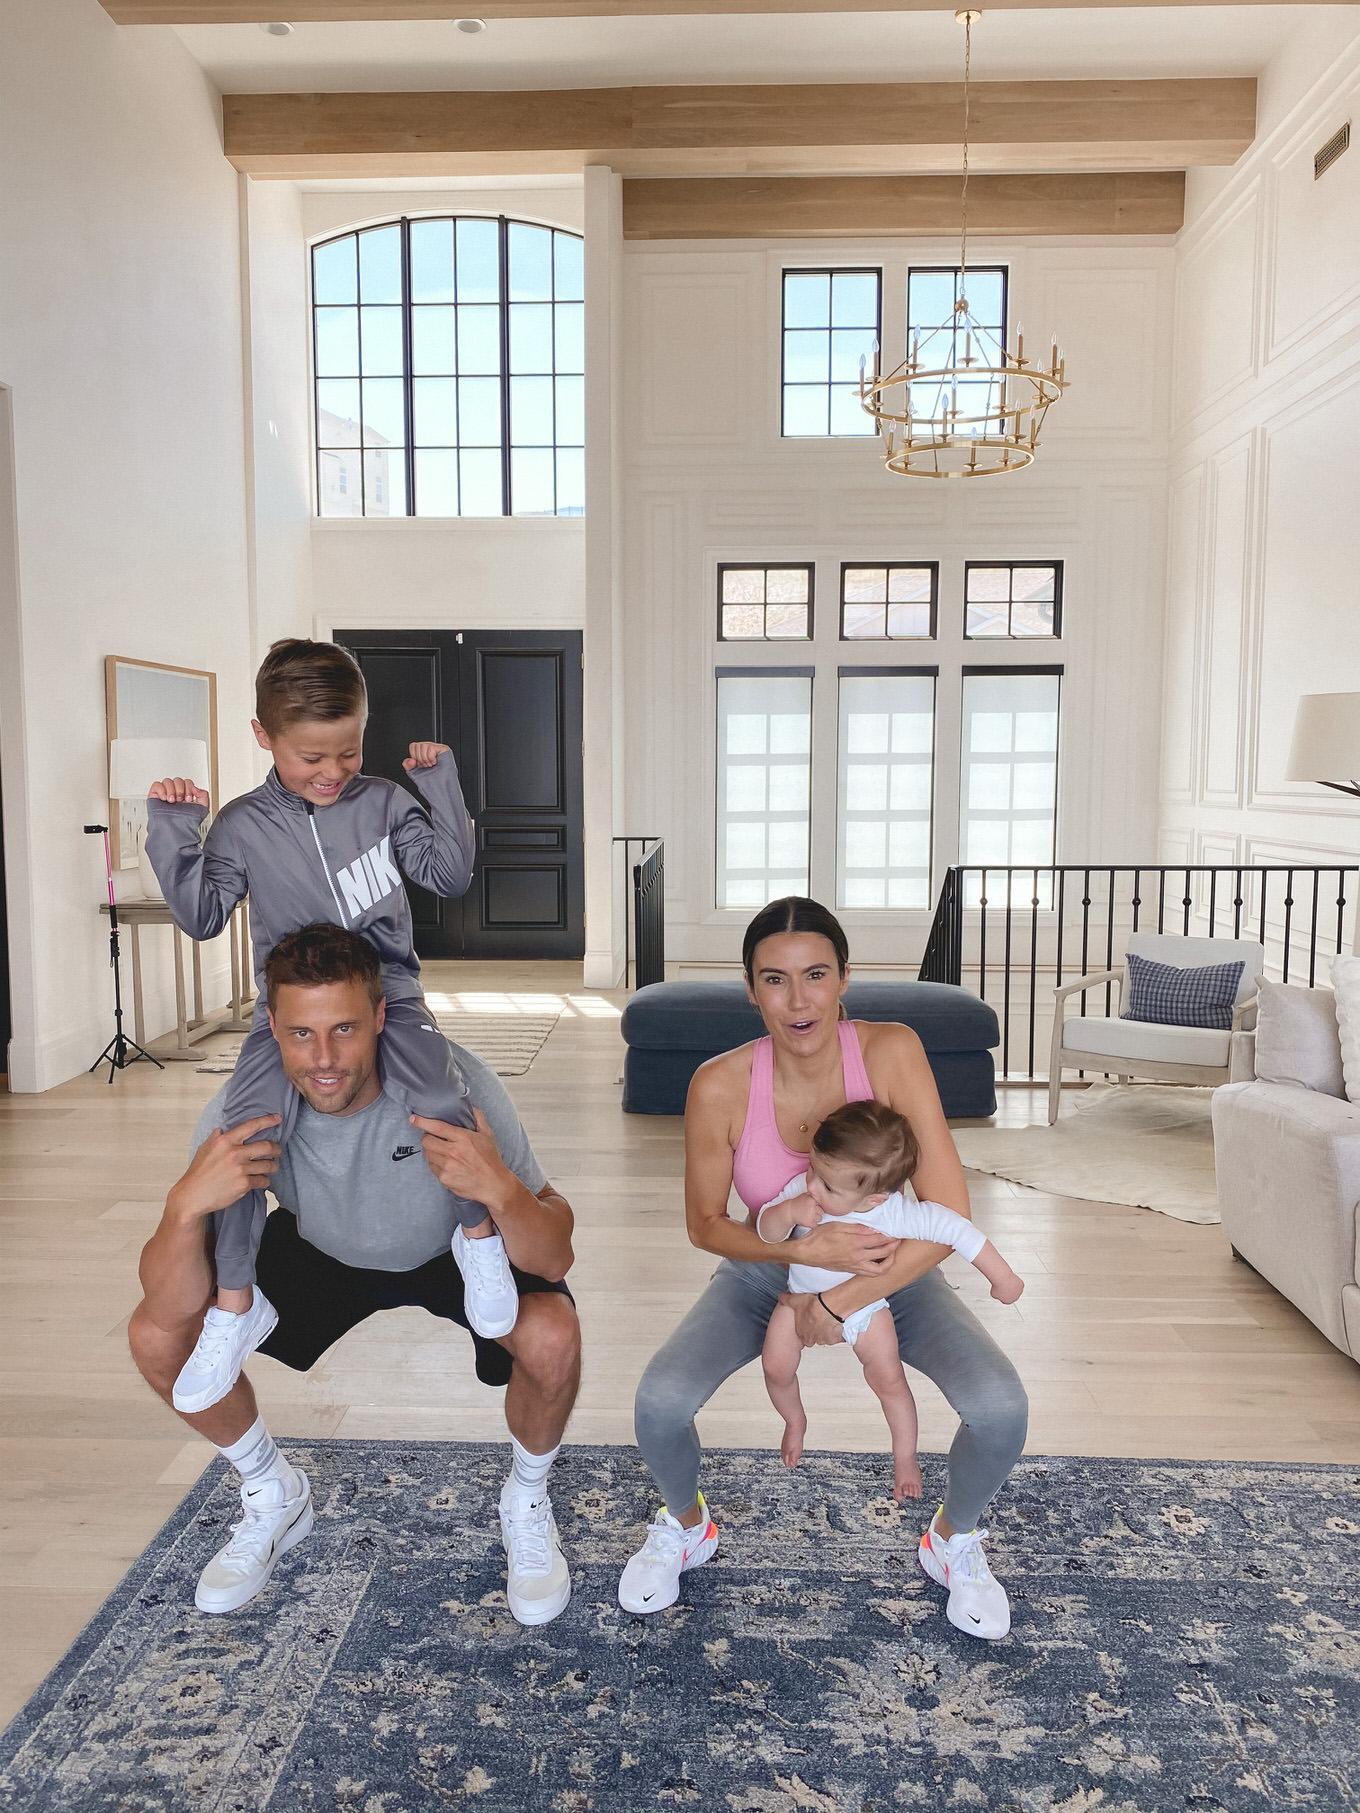 home workout pickmeups